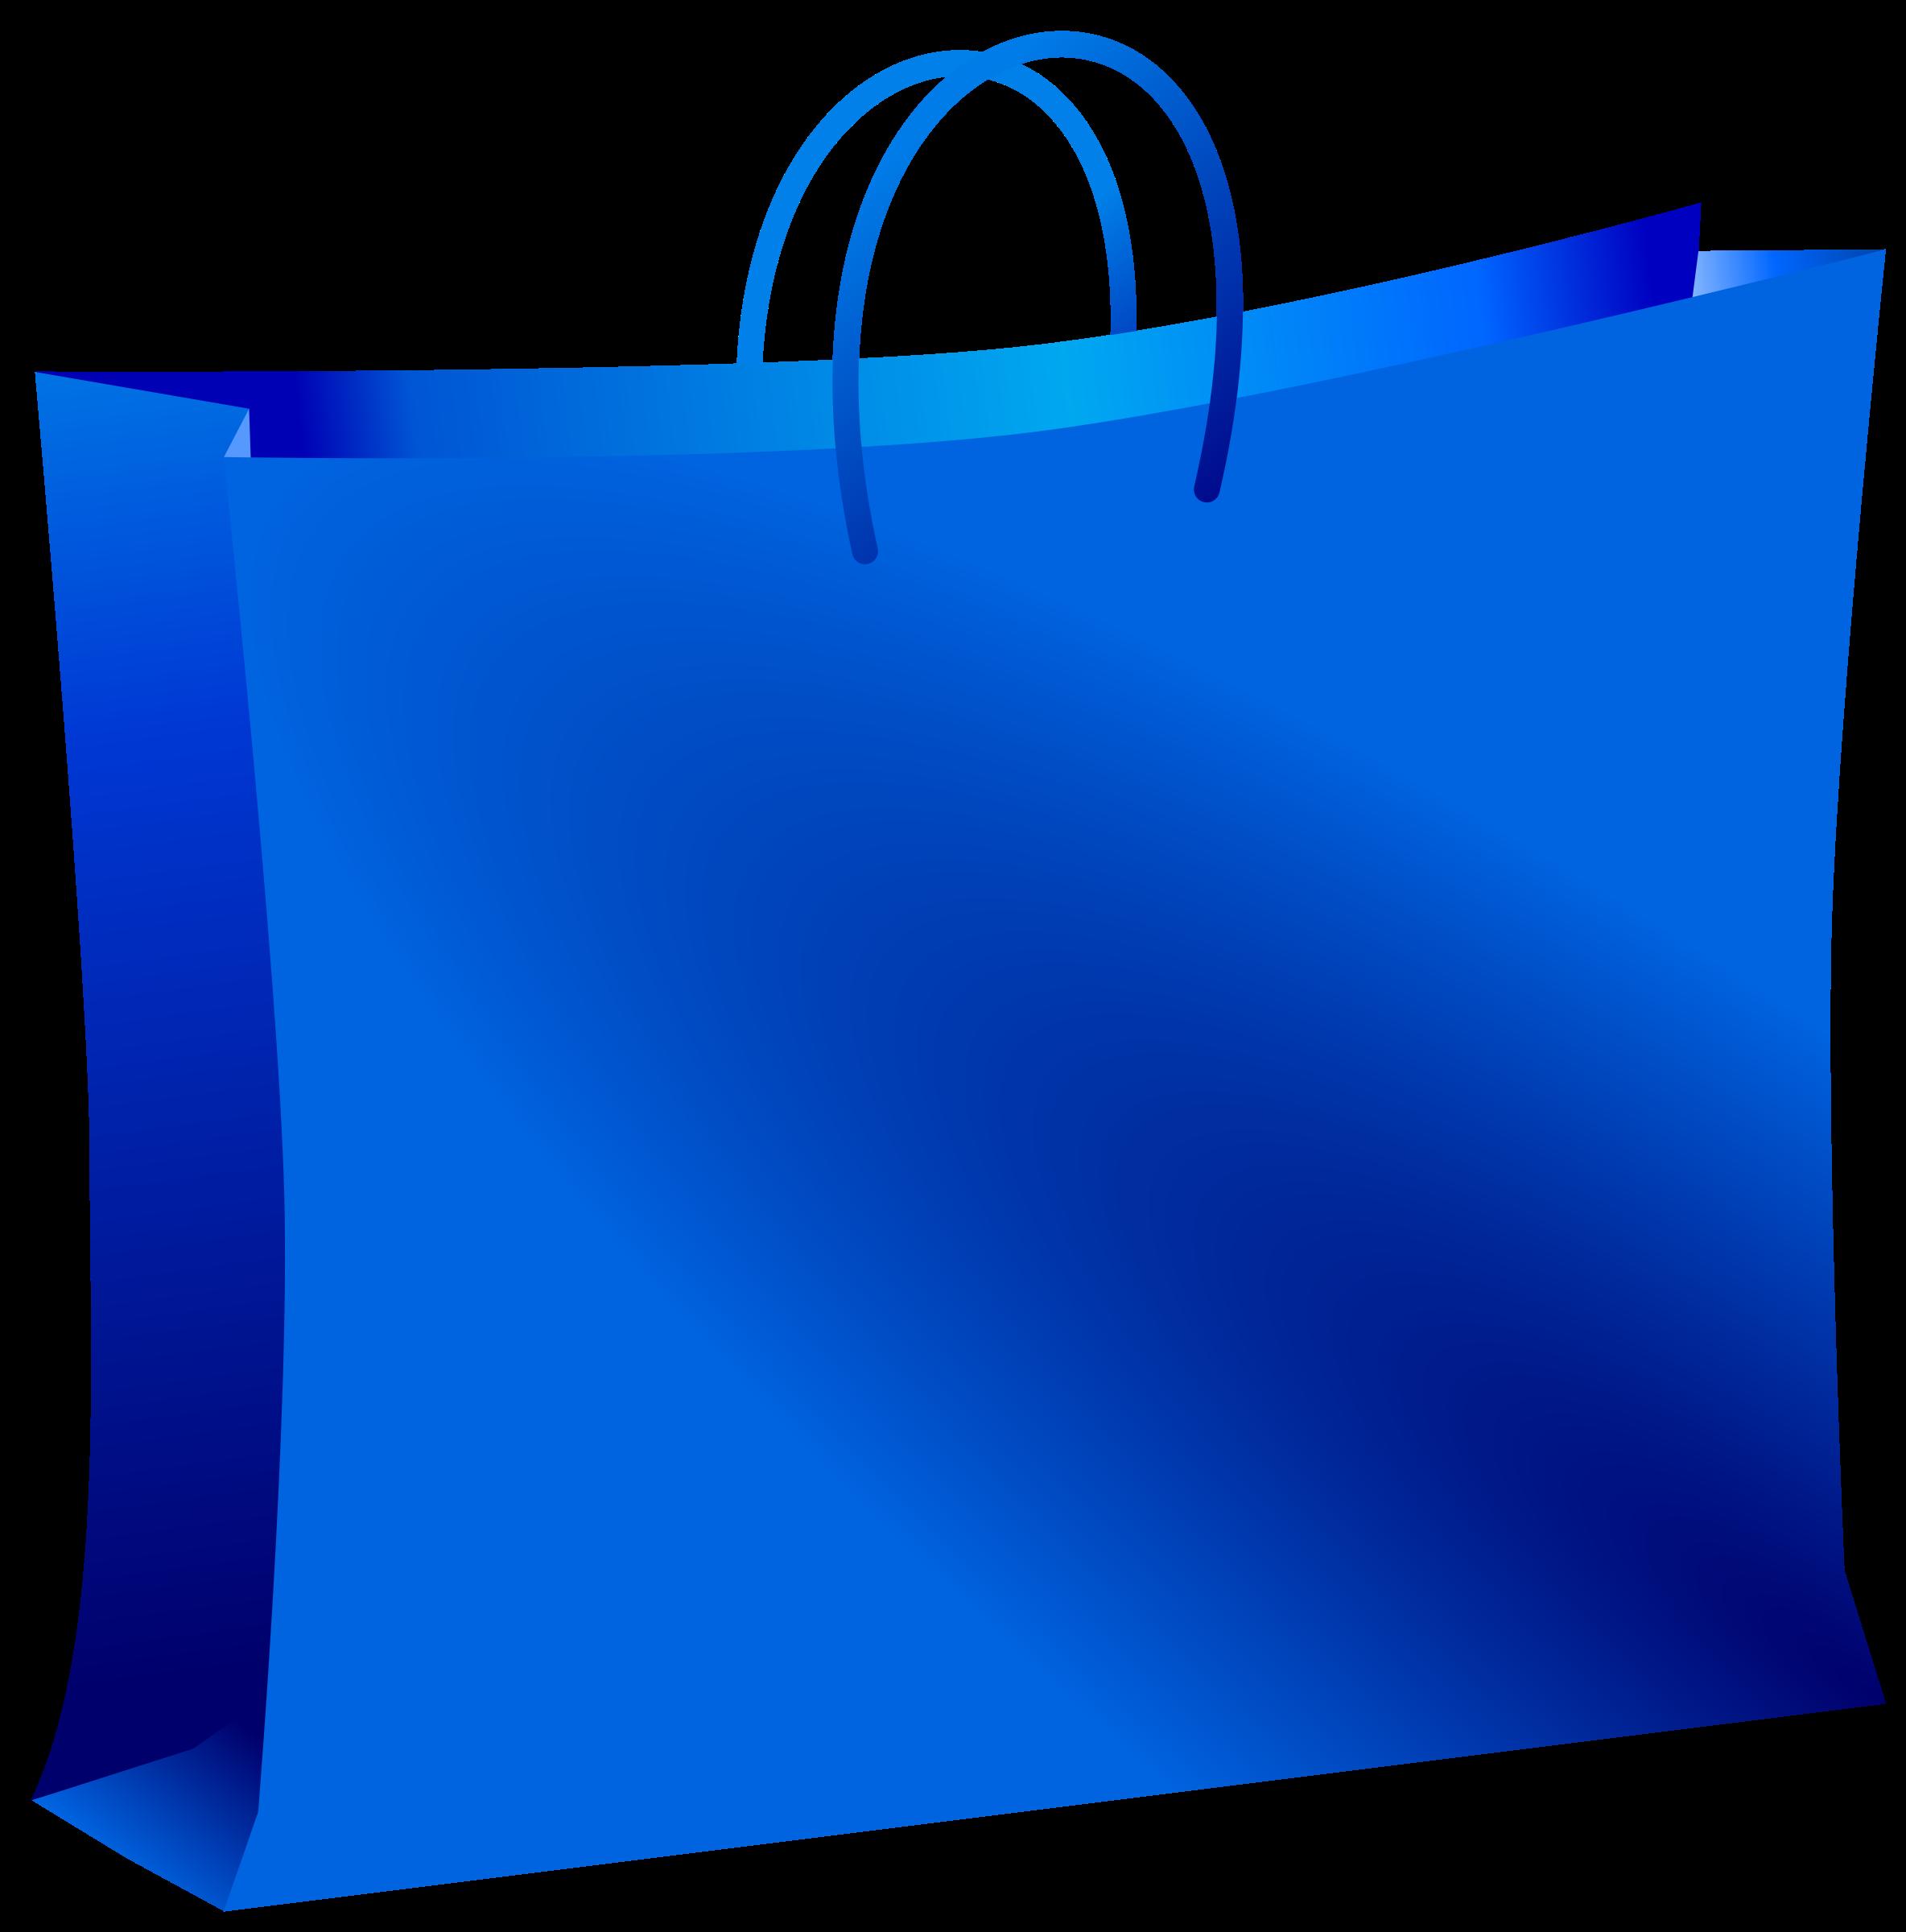 Bag clipart rectangle Bag bag Blue Clipart Blue